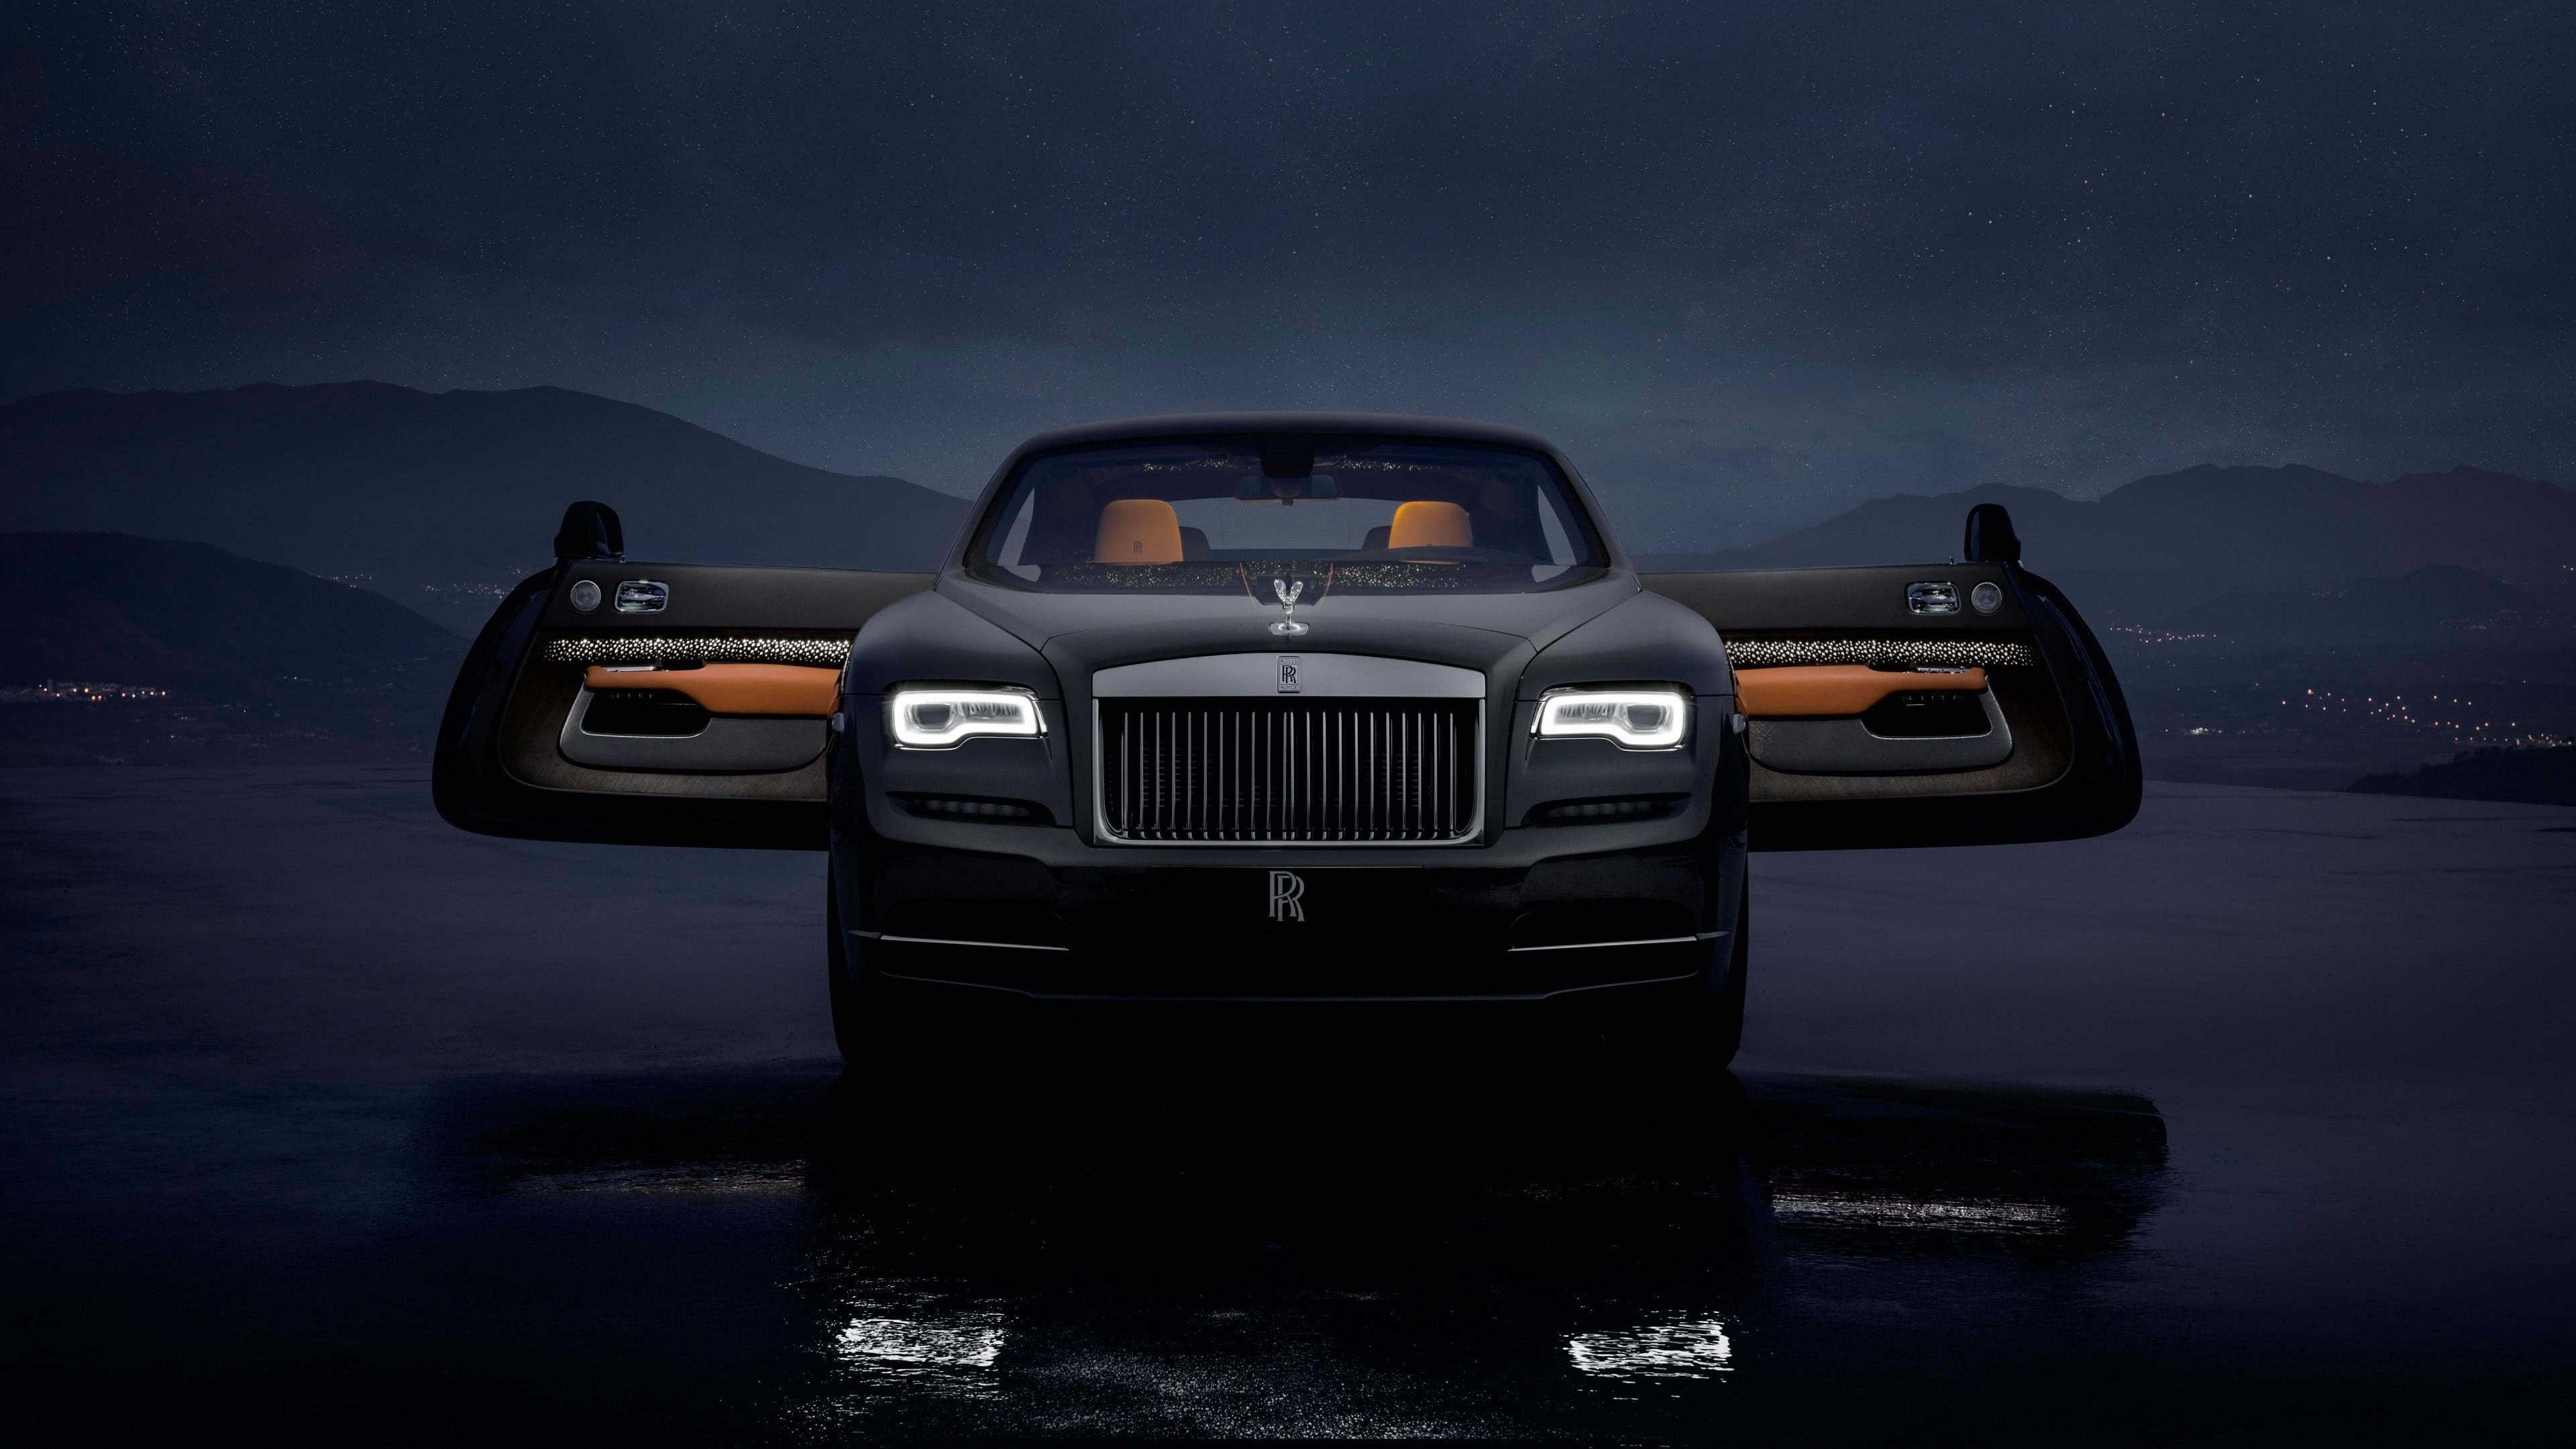 Rolls Royce Wraith Luminary Collection Uhd 4k Wallpaper Pixelz